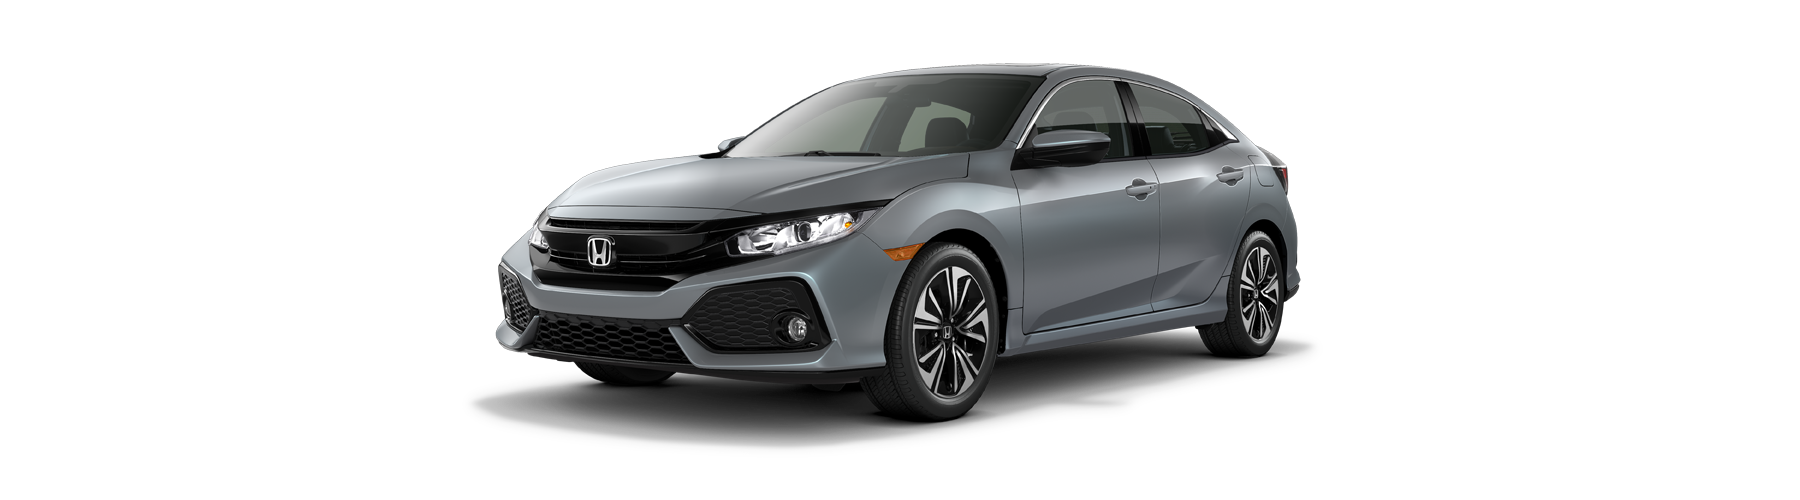 2017 Honda Accord Thailand 2017 2018 Best Cars Reviews   2017 - 2018 ...